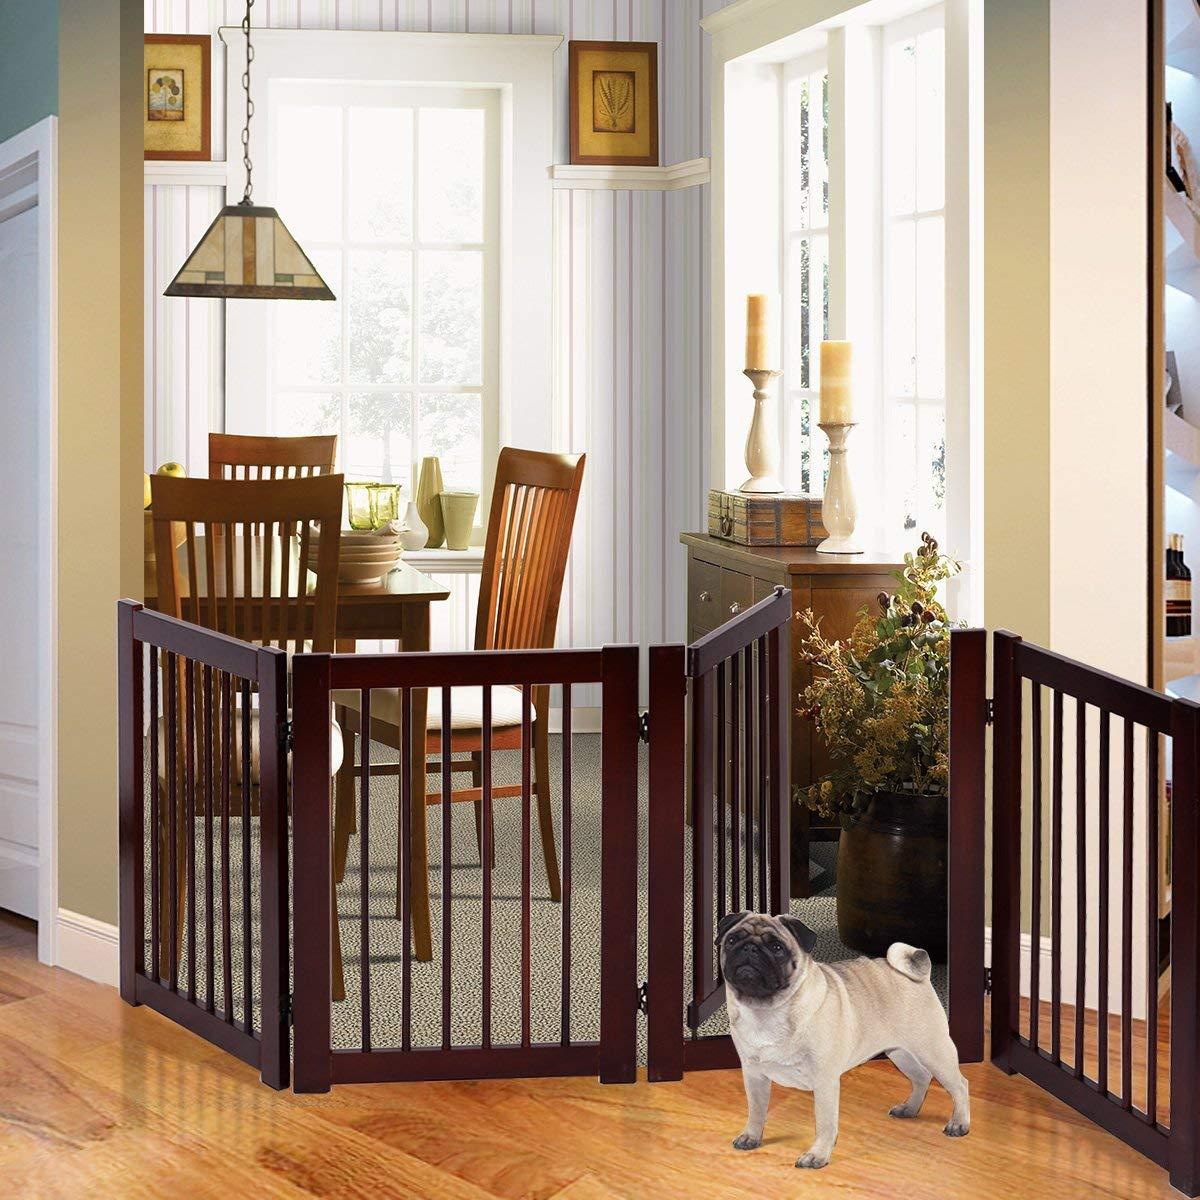 Petsite 30 H Pet Gate with Walk Through Door, Indoor Outdoor Baby Gate, Wooden Pet Playpen, Folding Adjustable Panel Safety Gate for Corridor, Doorway, Stairs, Extra Wide, Cerise Finish, 80 W